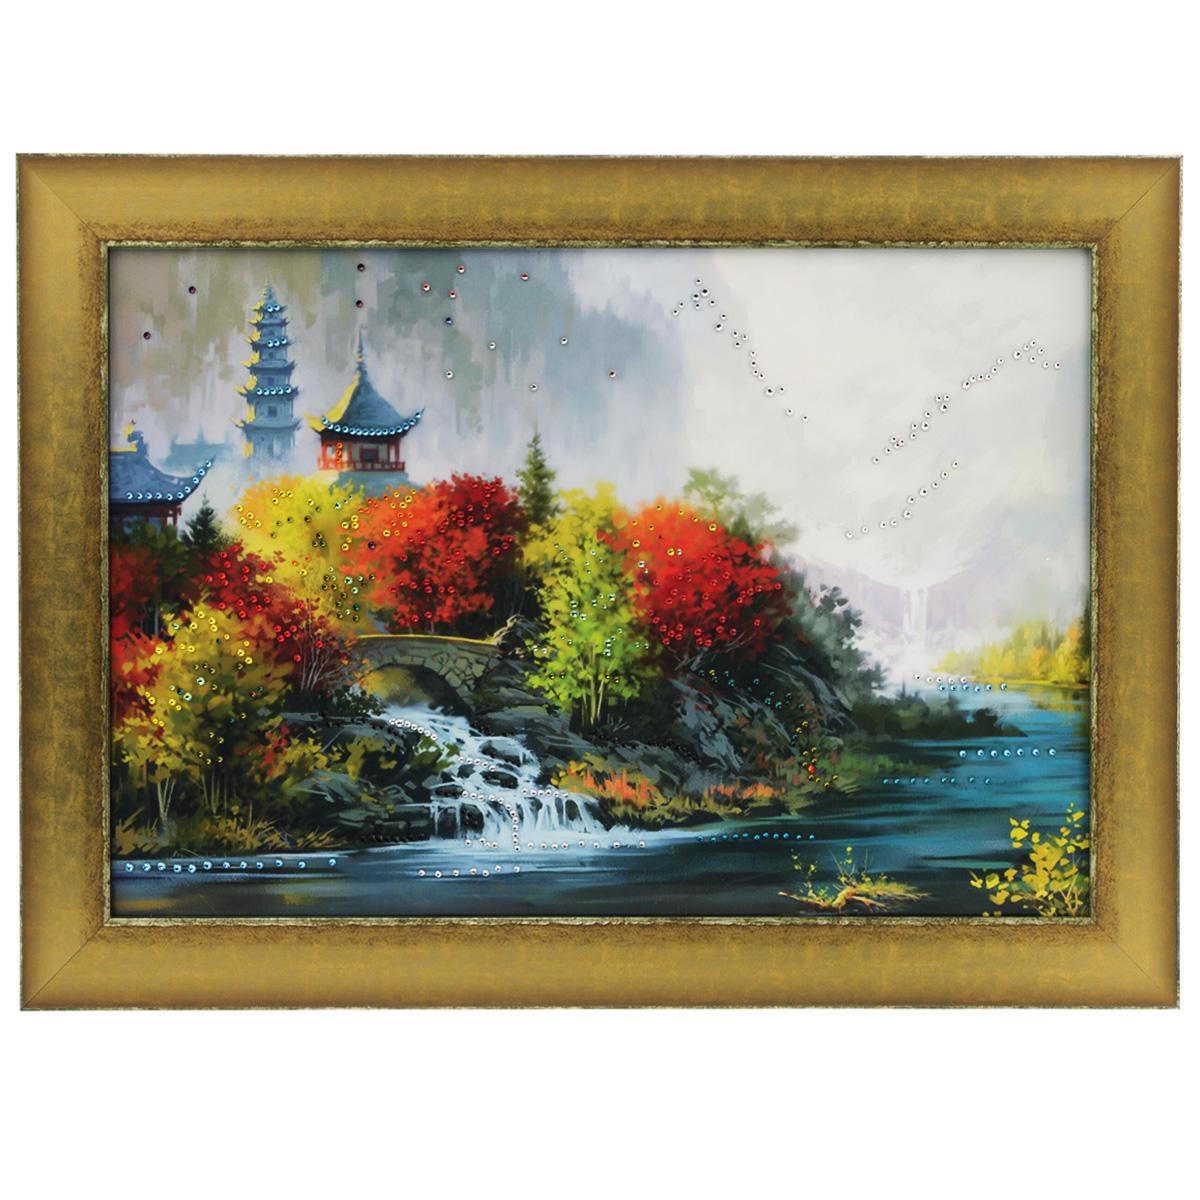 Картина с кристаллами Swarovski Восток, 70 см х 50 см картины в квартиру картина etude 2 102х130 см